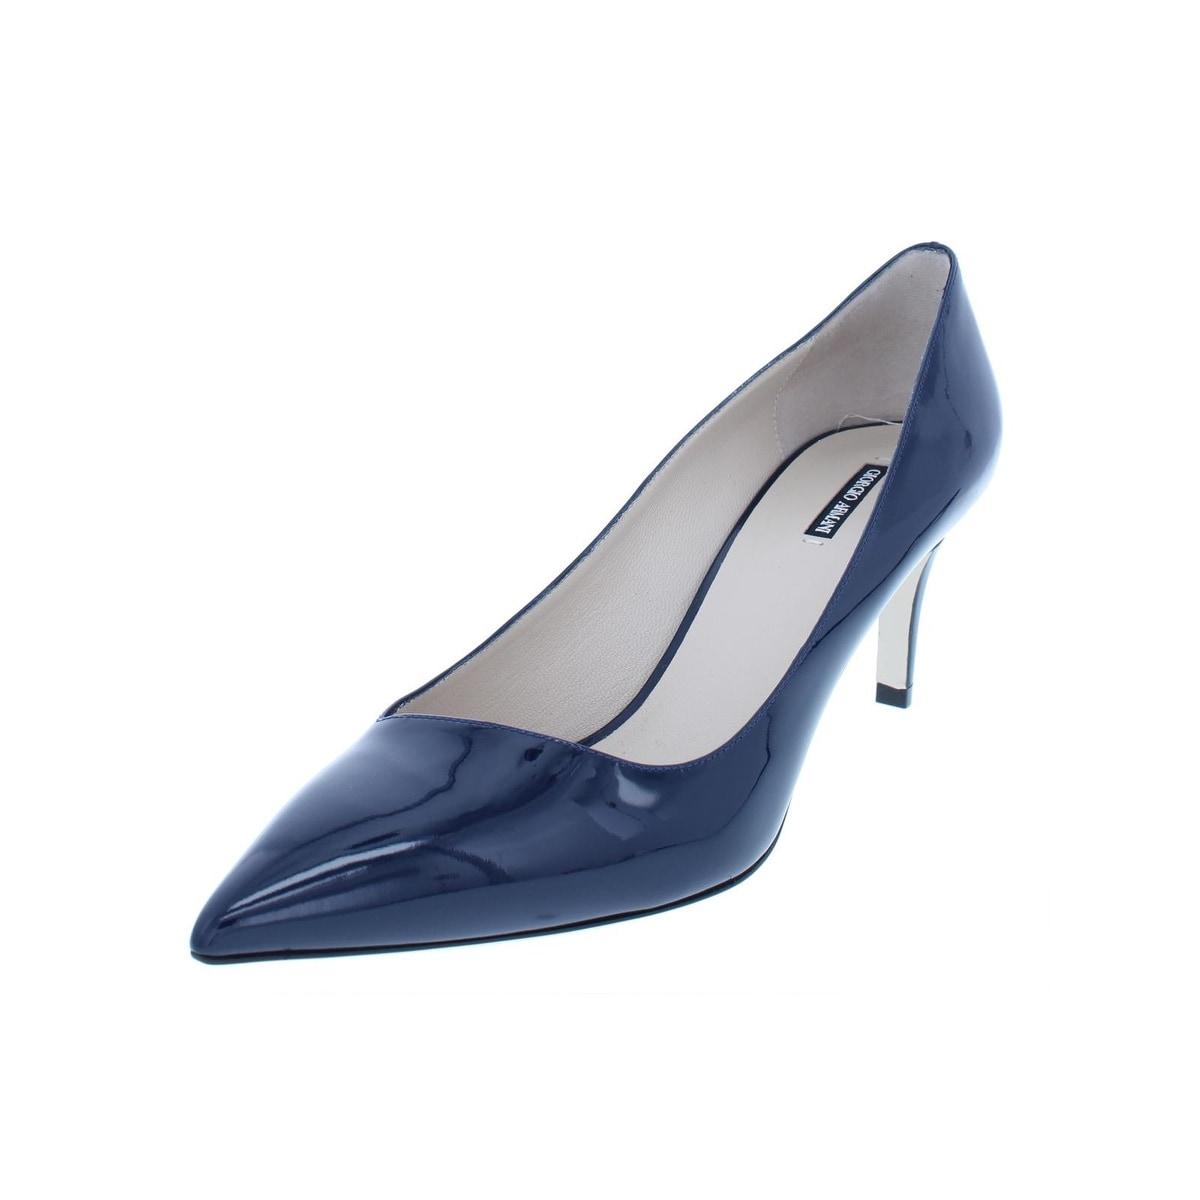 344a54e86fd3 Giorgio armani womens vernice pointed toe heels patent leather evening jpg  1200x1200 Armani heels